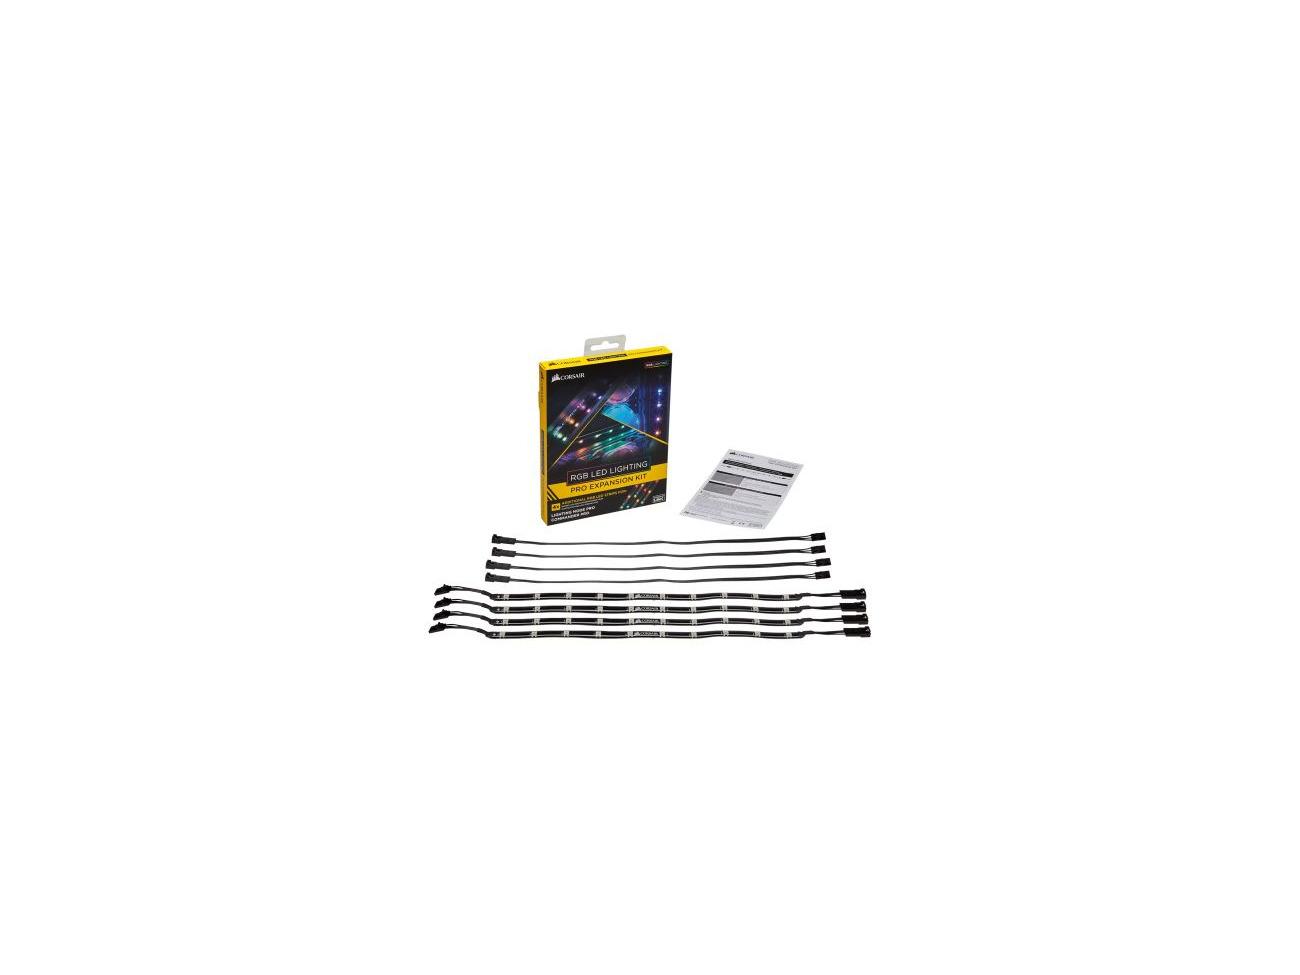 Buy Corsair Rgb Led Lighting Pro Expansion Kit 4 X